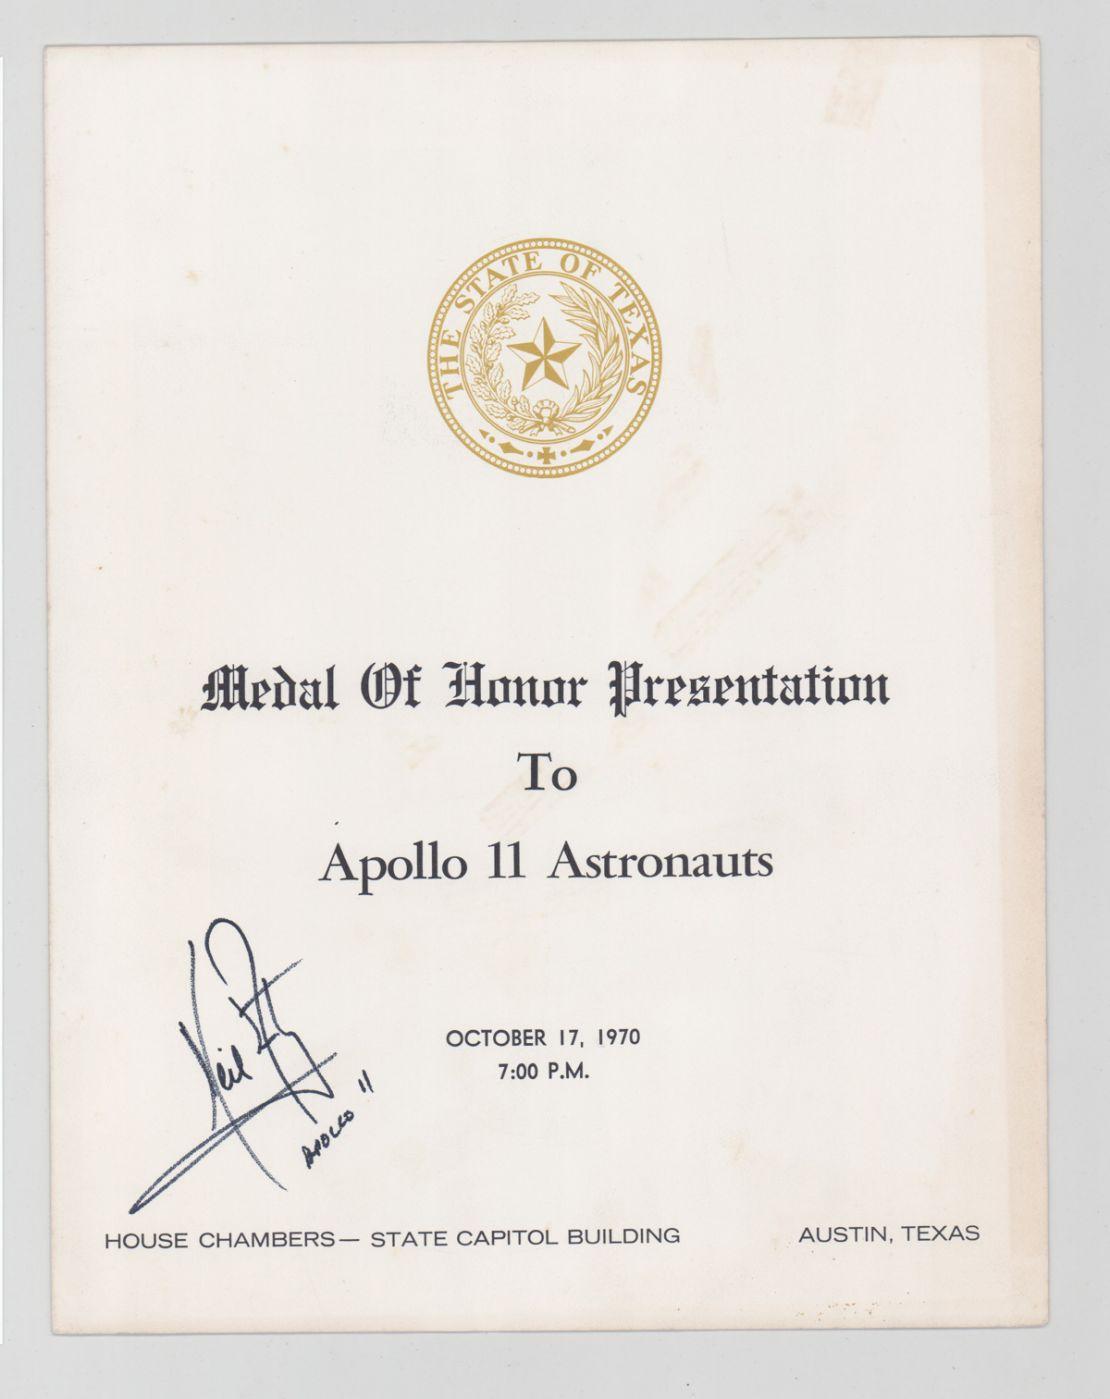 State of Texas Medal of Honor Presentation program